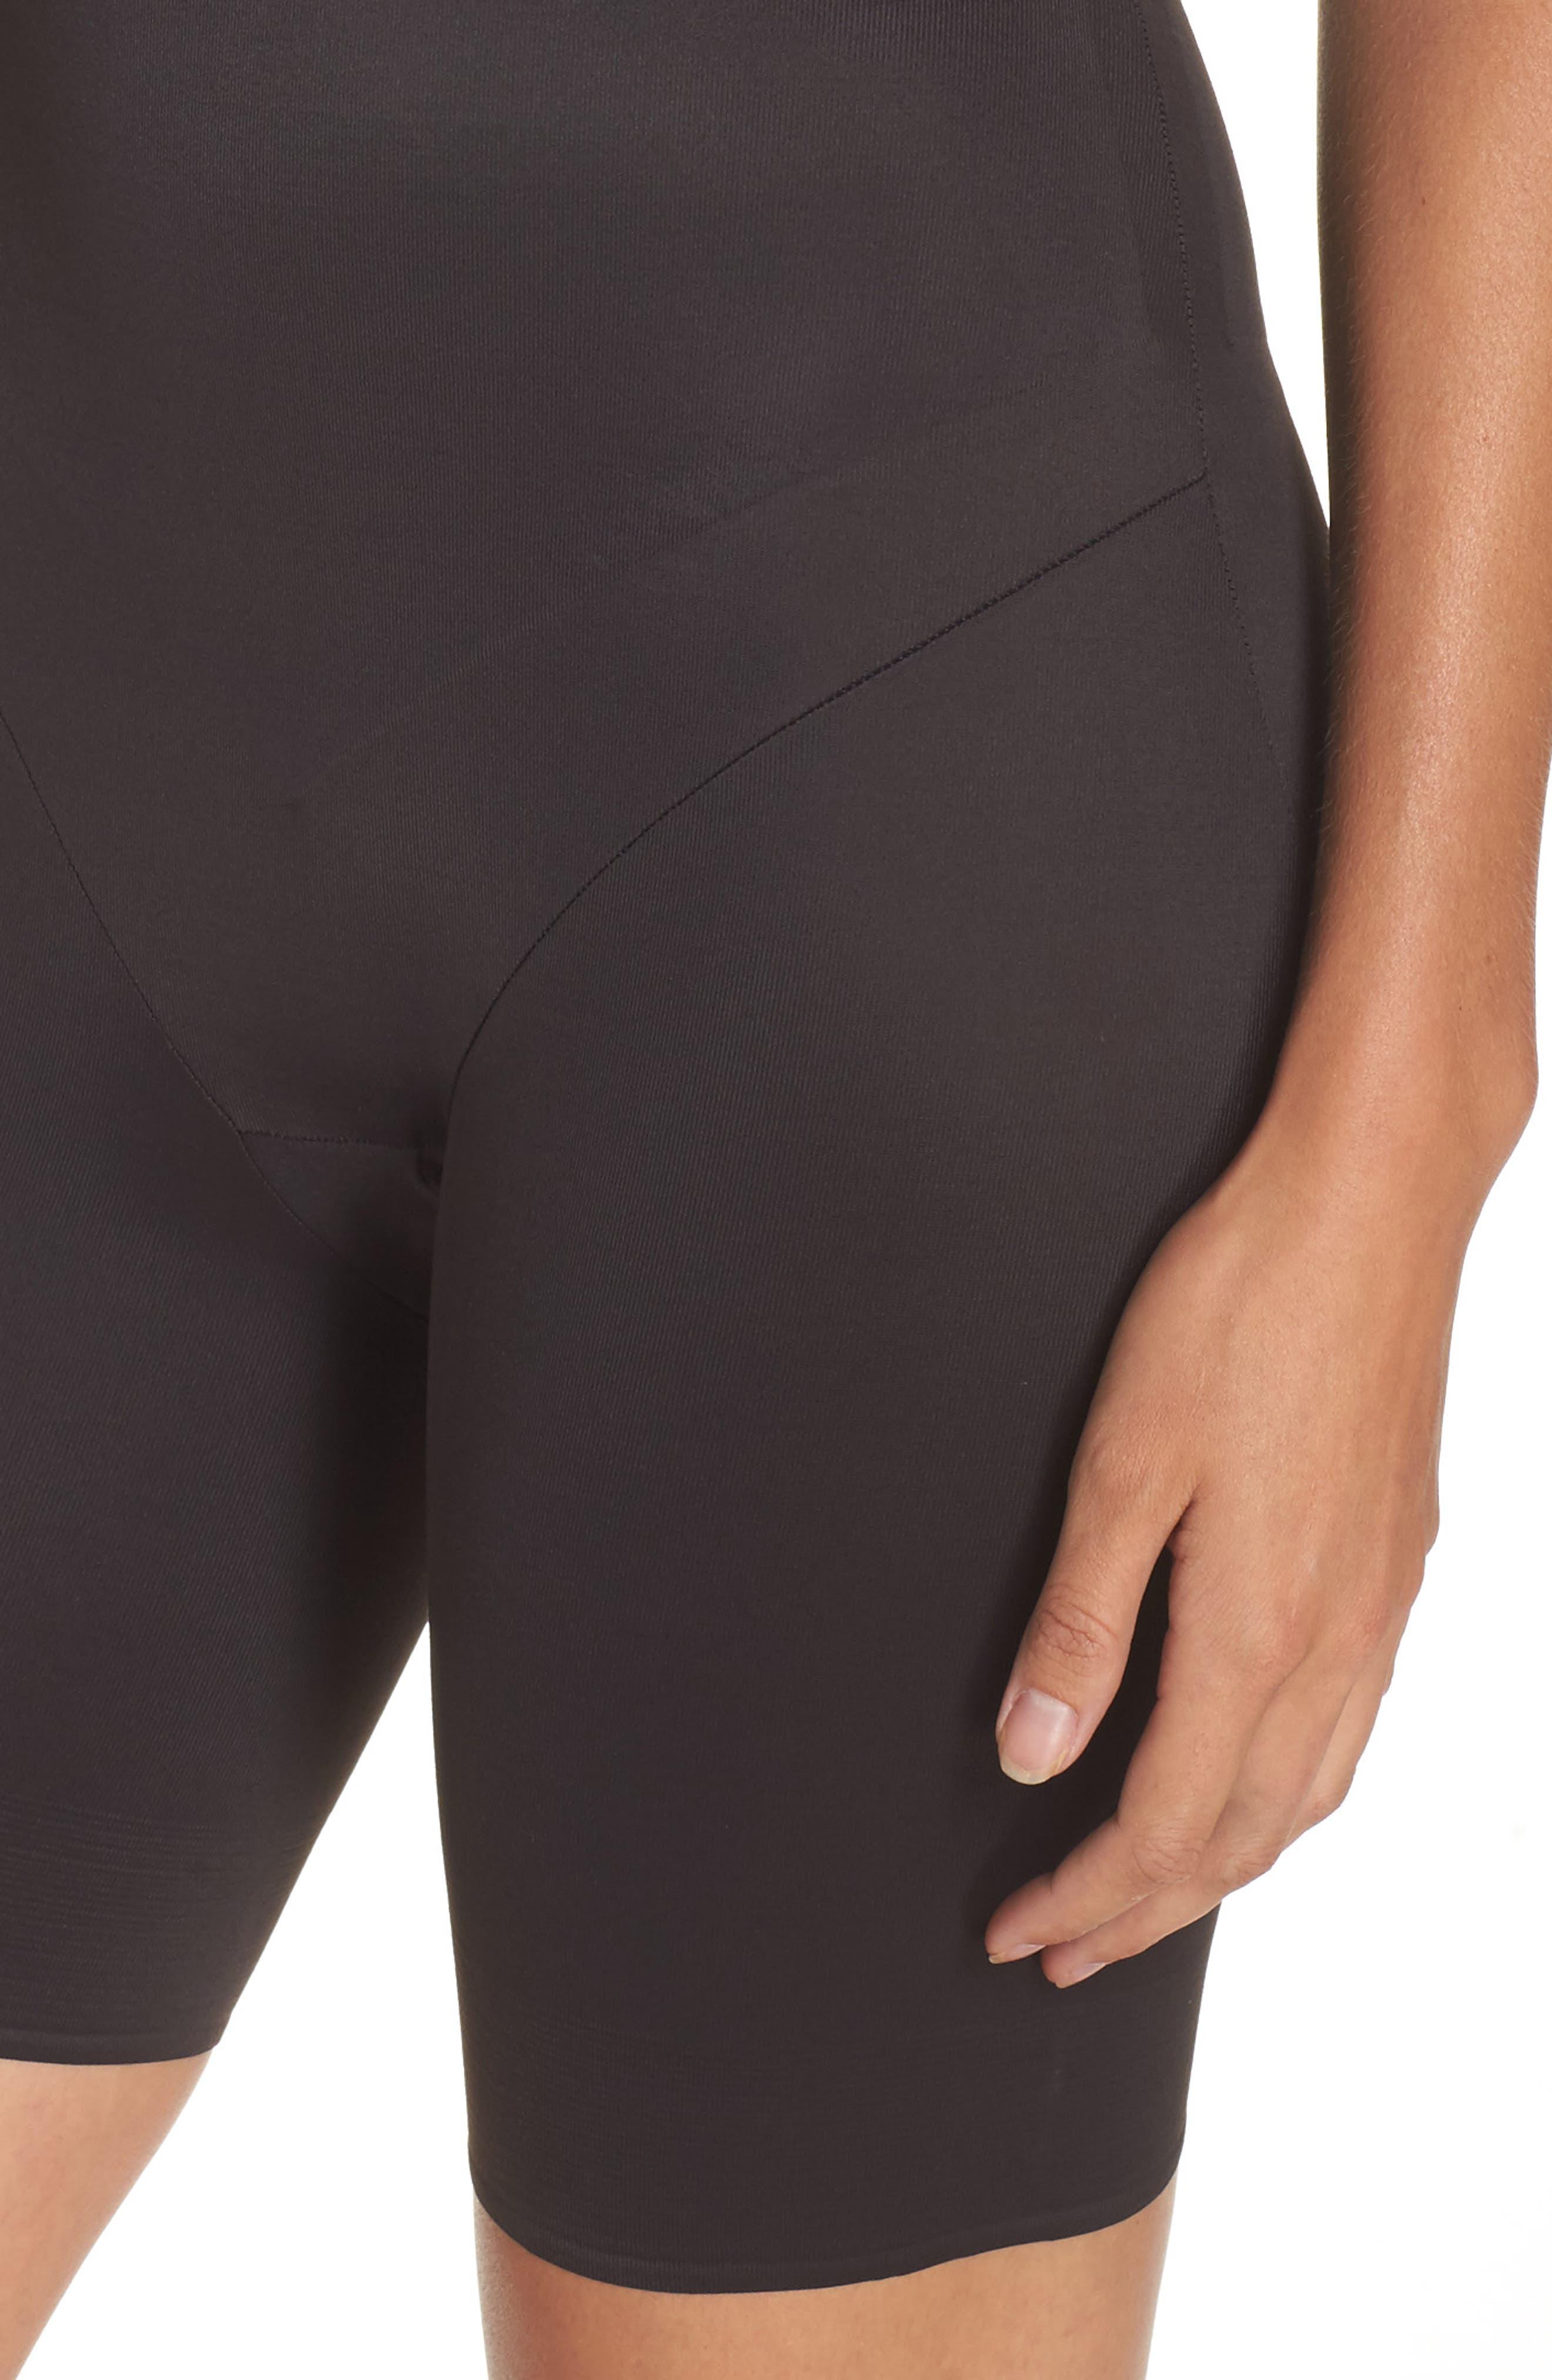 Torsette Underbust Mid Thigh Bodysuit Shaper,                             Alternate thumbnail 5, color,                             BLACK